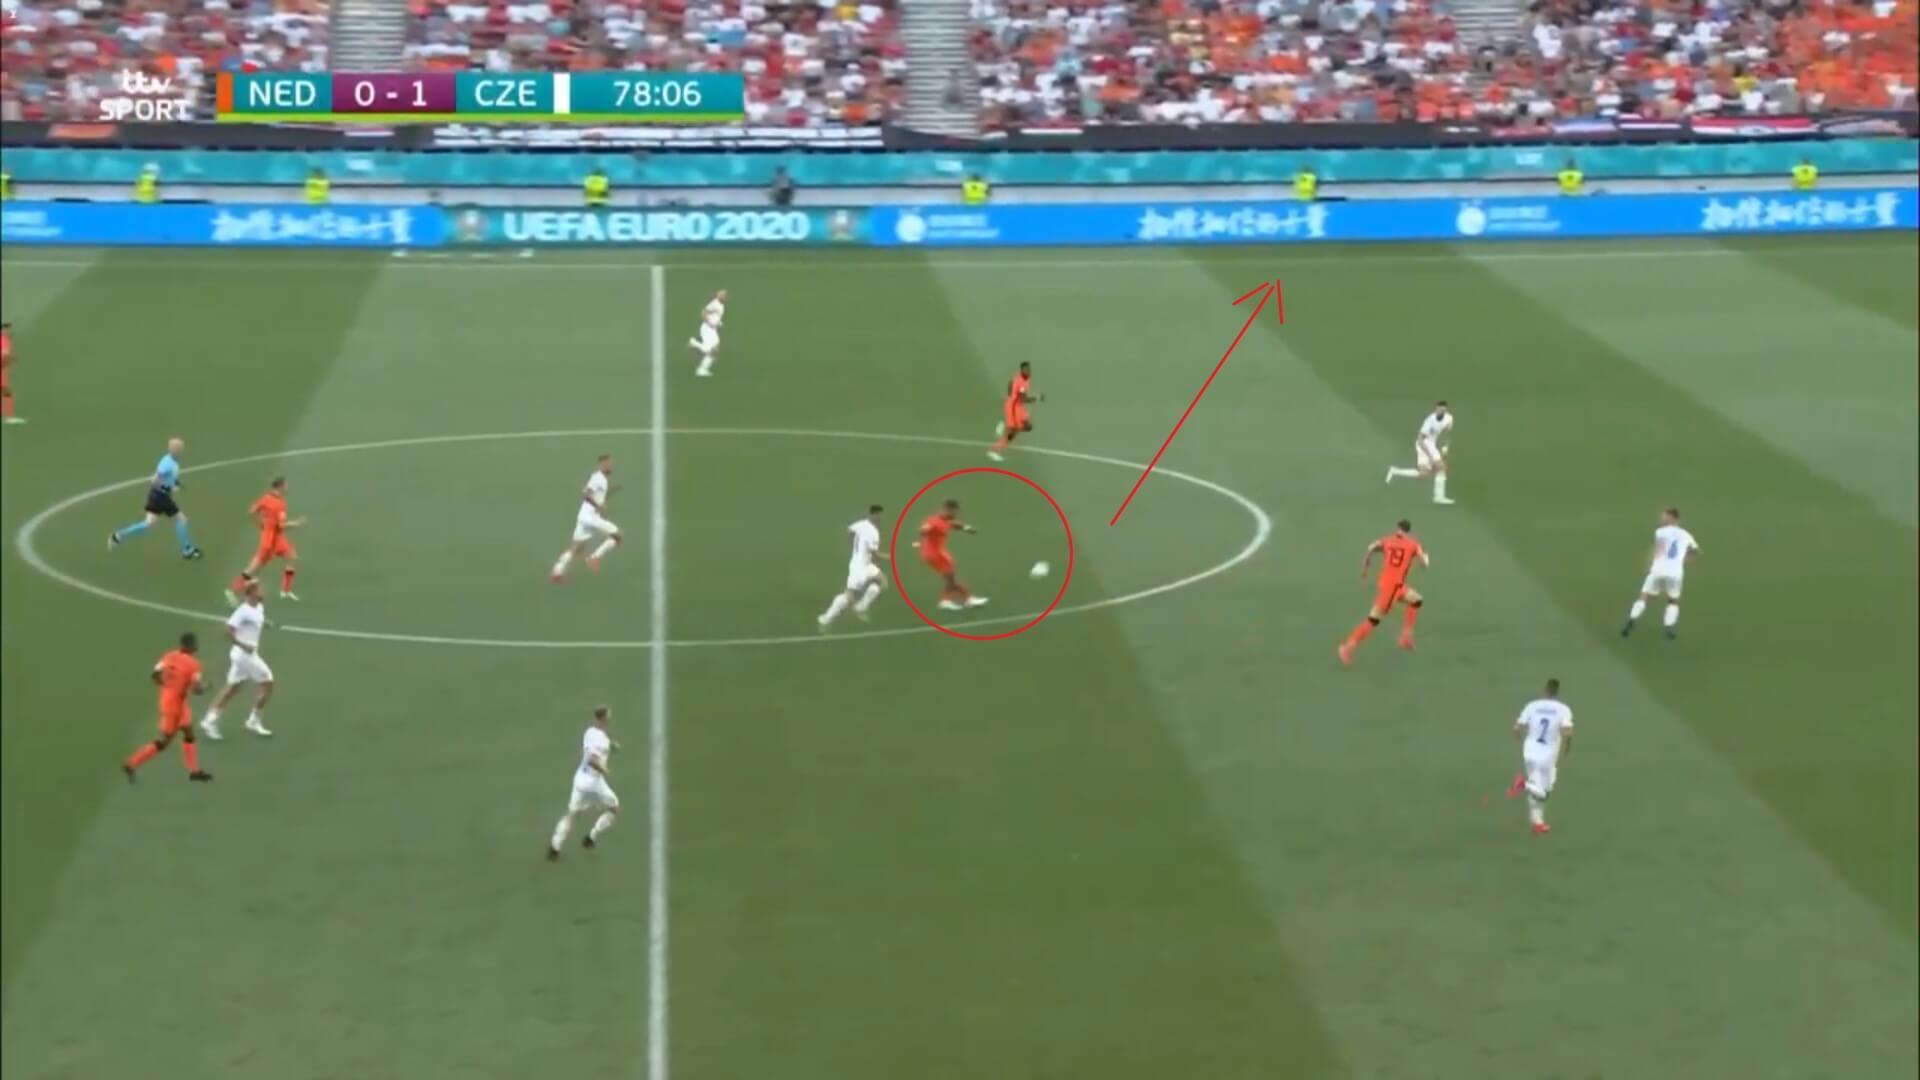 EURO 2020: Netherlands v Czech Republic - tactical analysis tactics